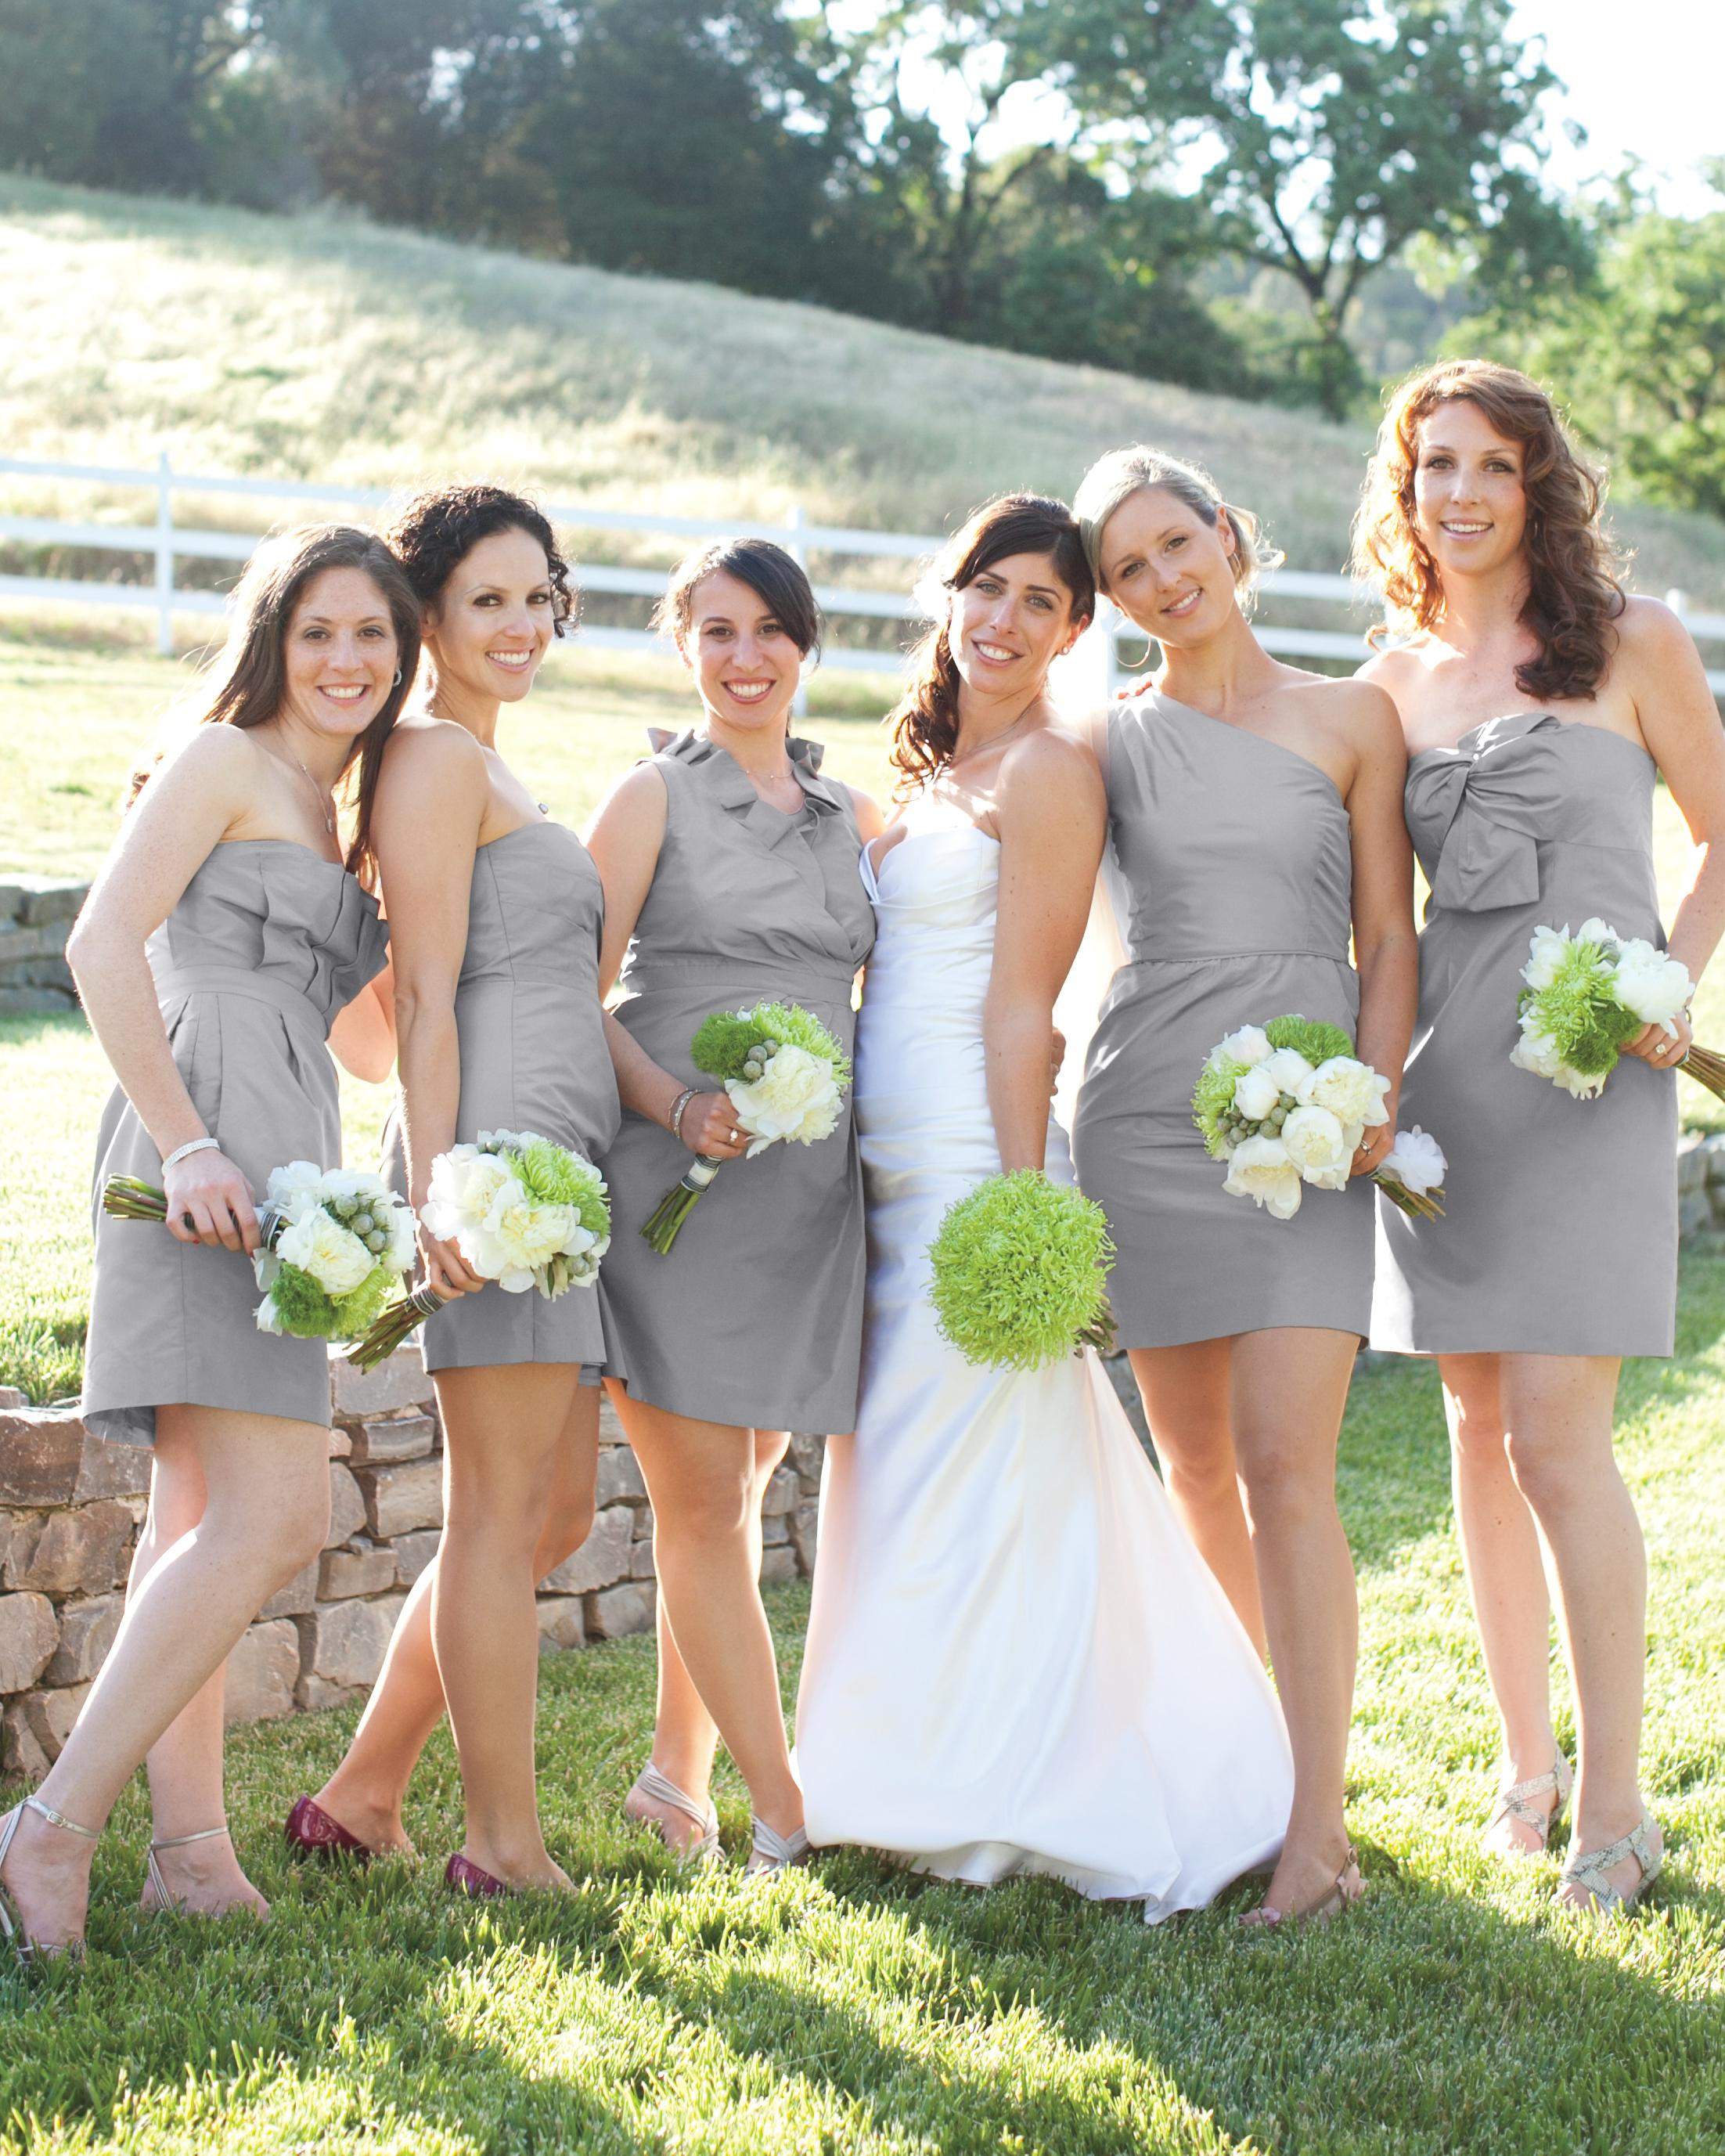 shoshana-jeremy-bridesmaids-0905-mwds110421.jpg